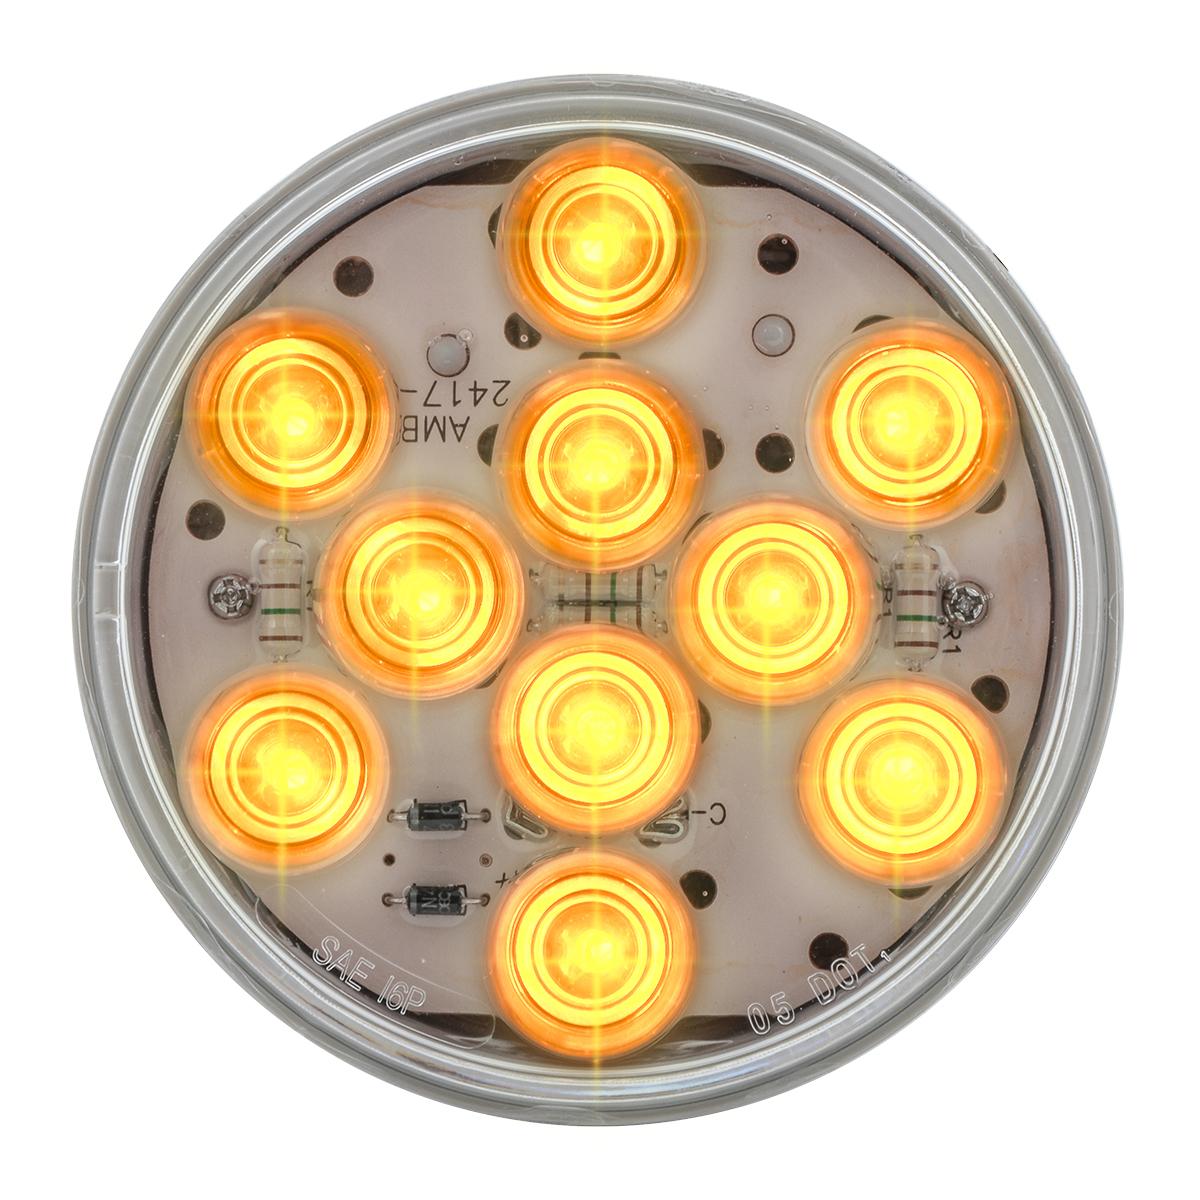 "77451 4"" Mega 10 LED Light in Amber/Clear"